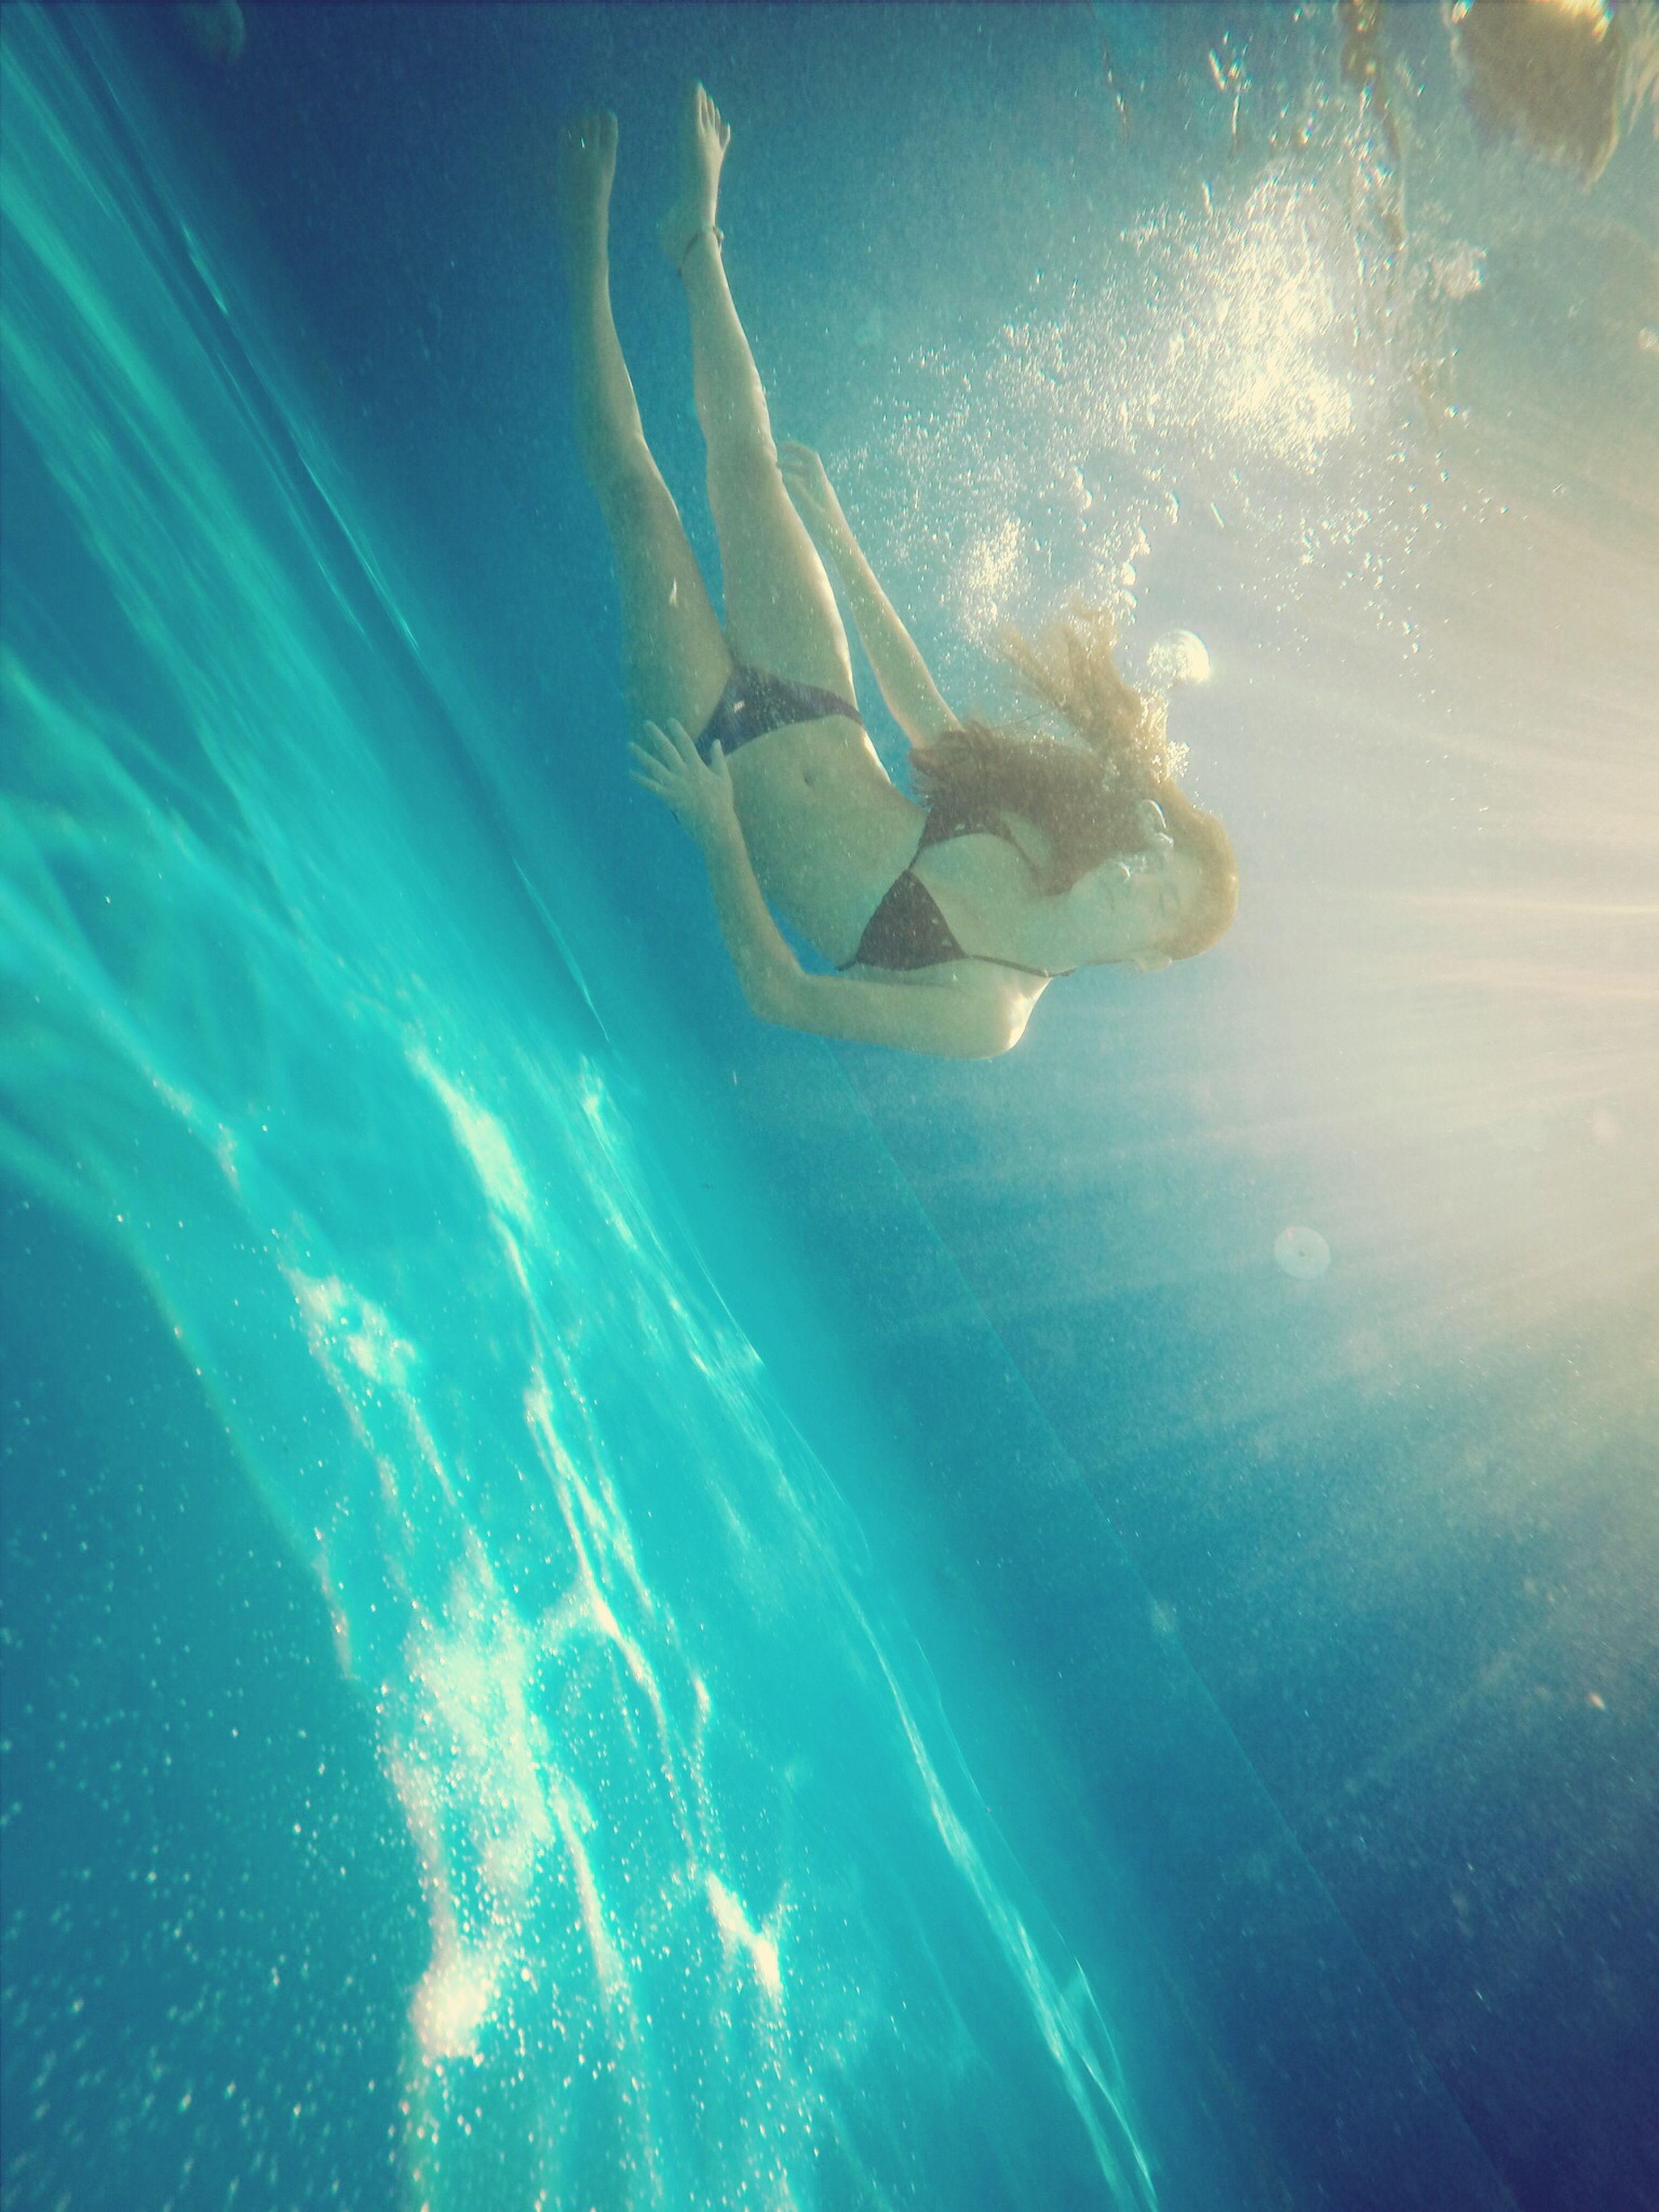 water, sea, swimming, leisure activity, lifestyles, underwater, blue, enjoyment, fun, undersea, men, motion, mid-air, animal themes, adventure, vacations, full length, sea life